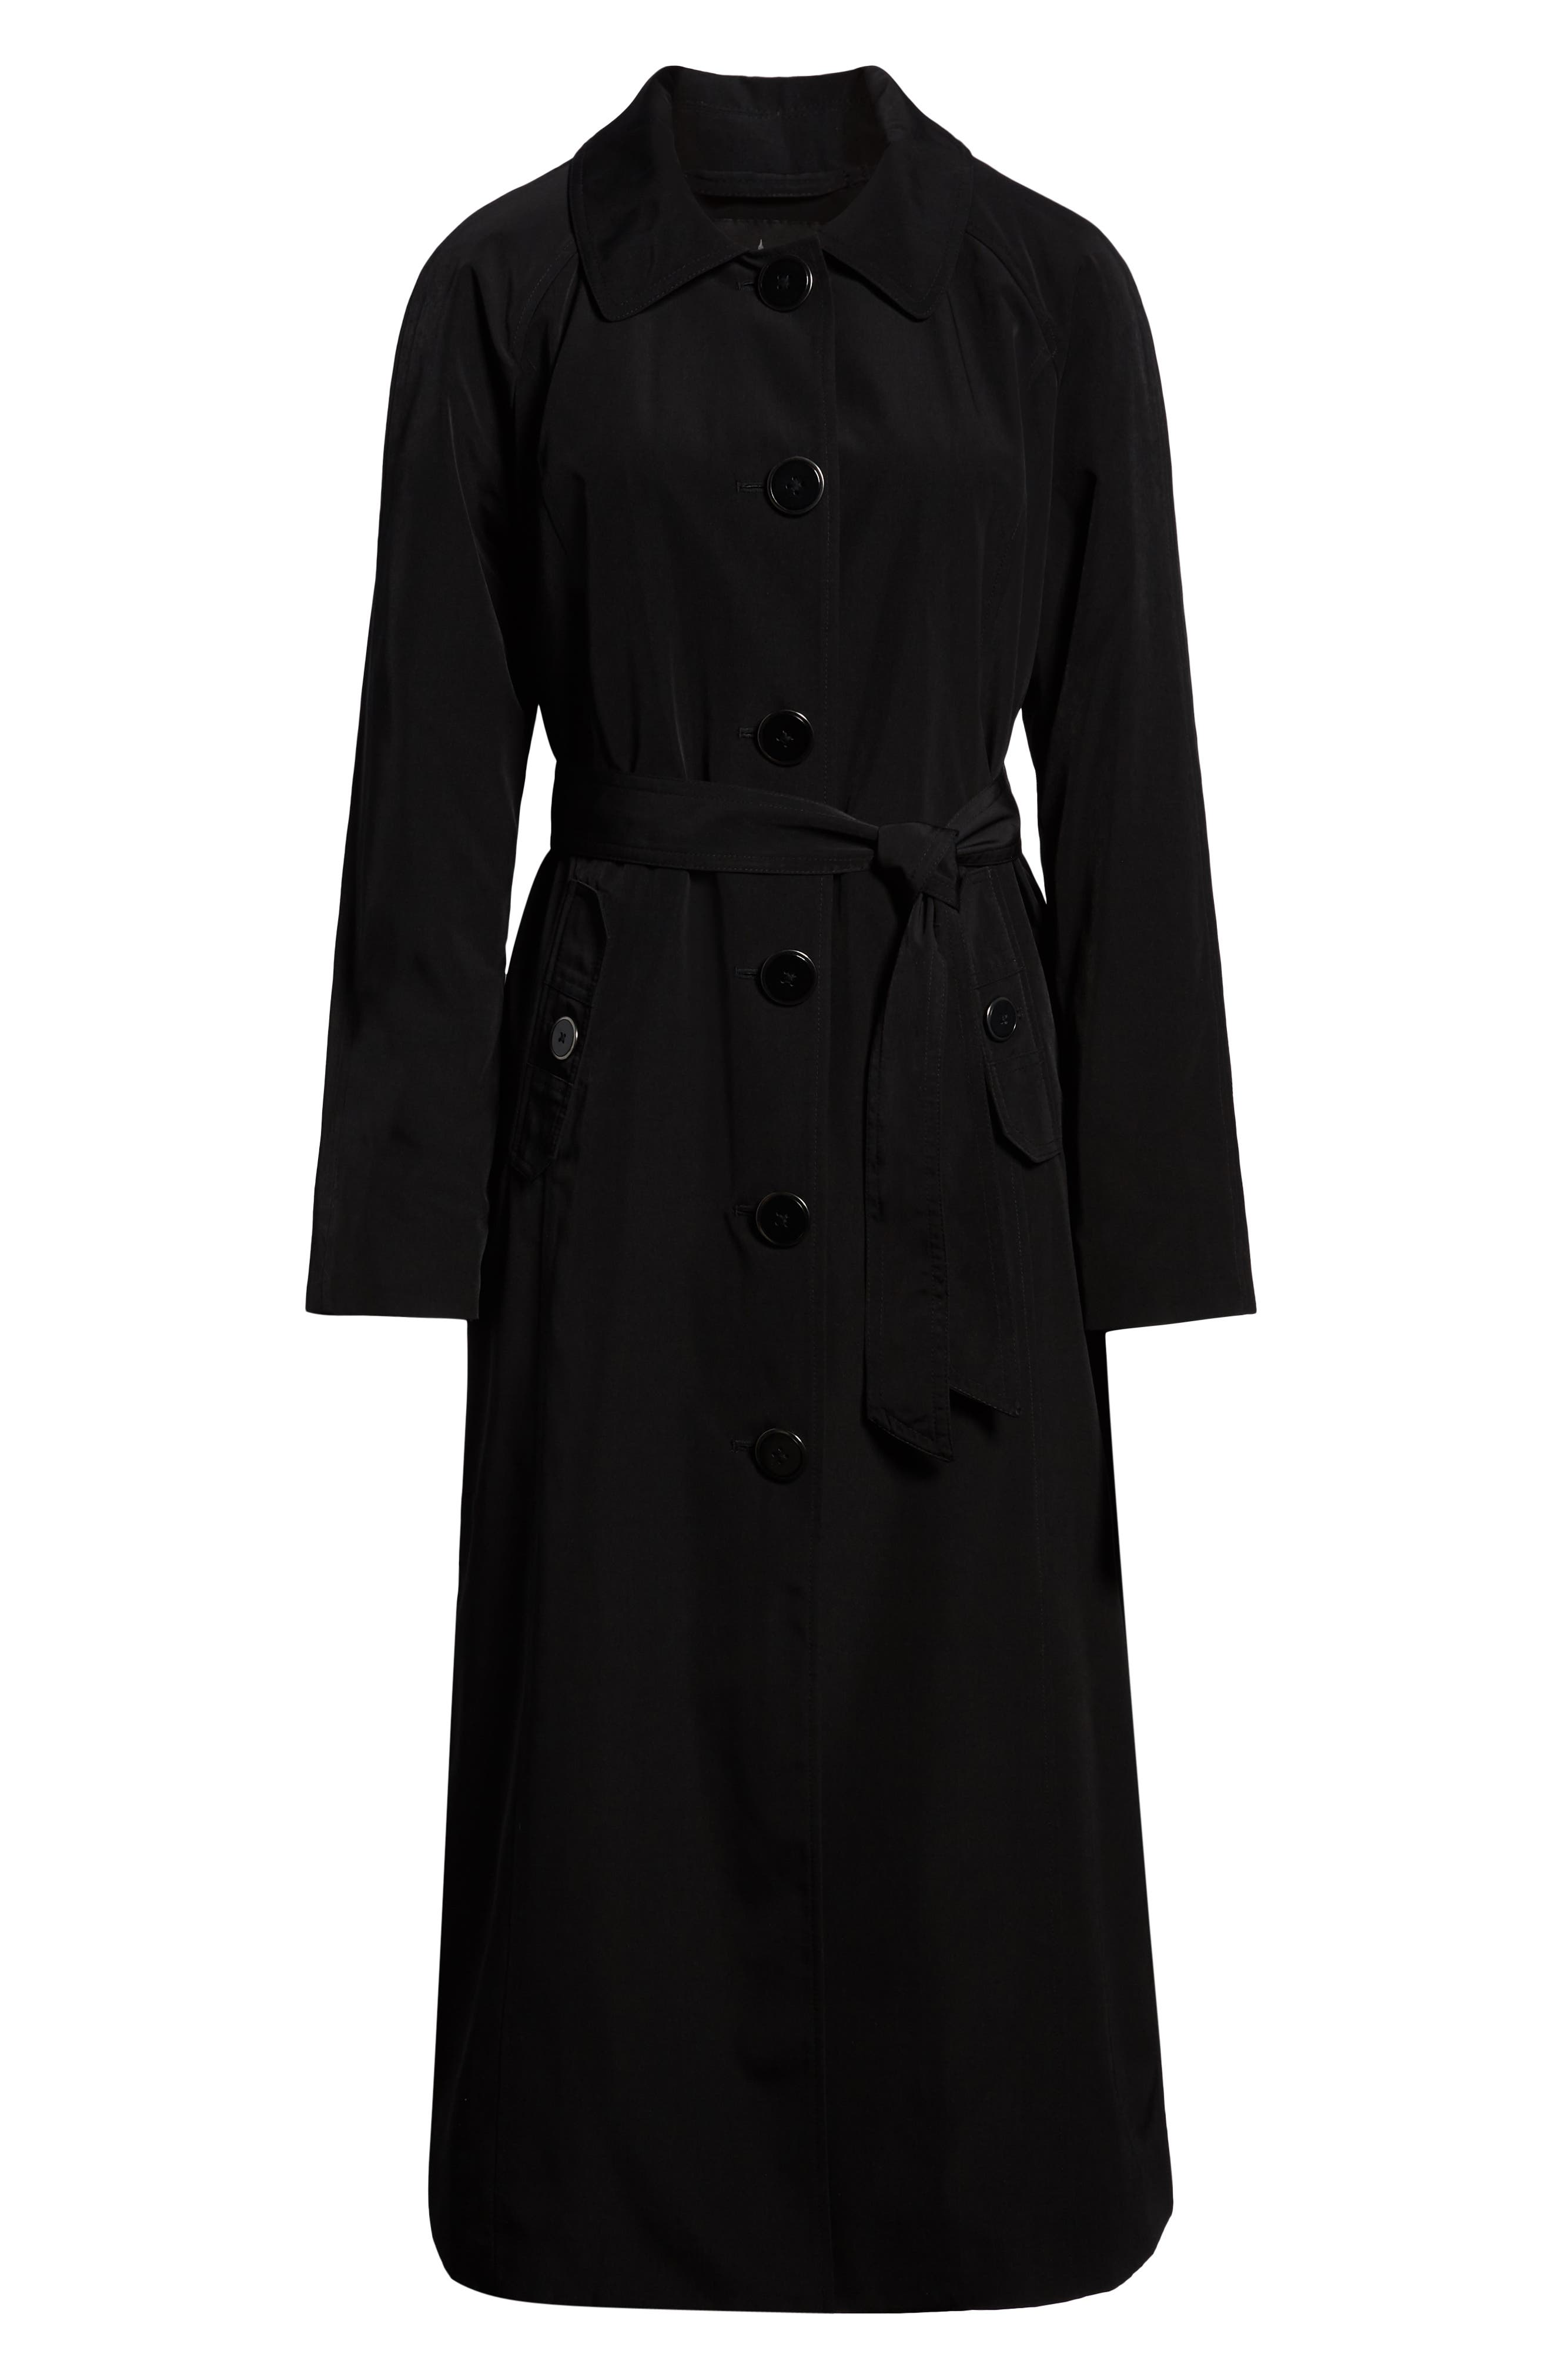 LONDON FOG, Long Trench Coat with Detachable Hood & Liner, Alternate thumbnail 6, color, BLACK